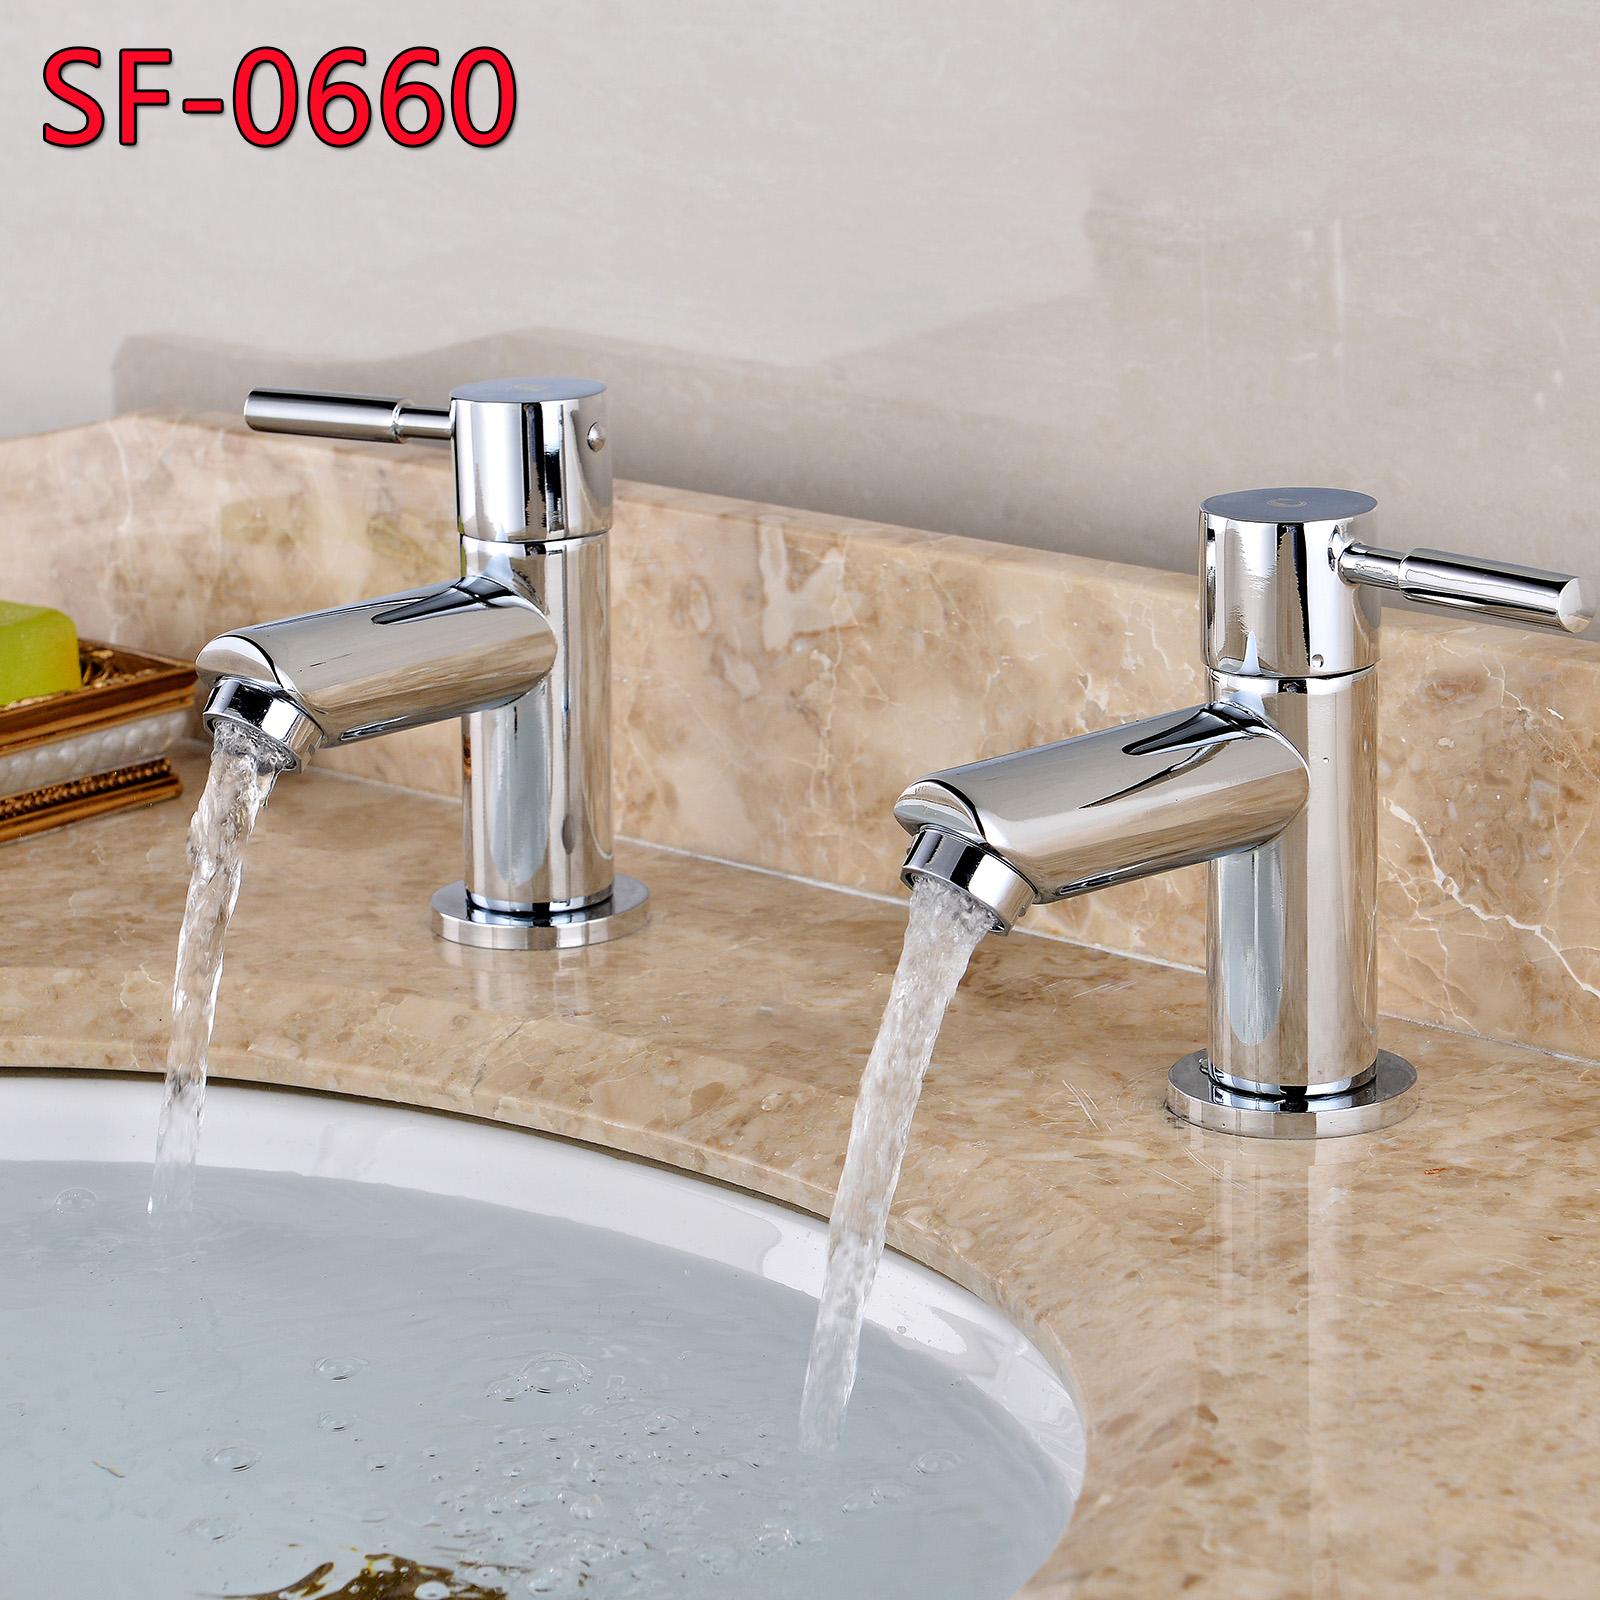 New!! Modern/Traditional Bathroom Kitchen Sink Mixer Taps ...